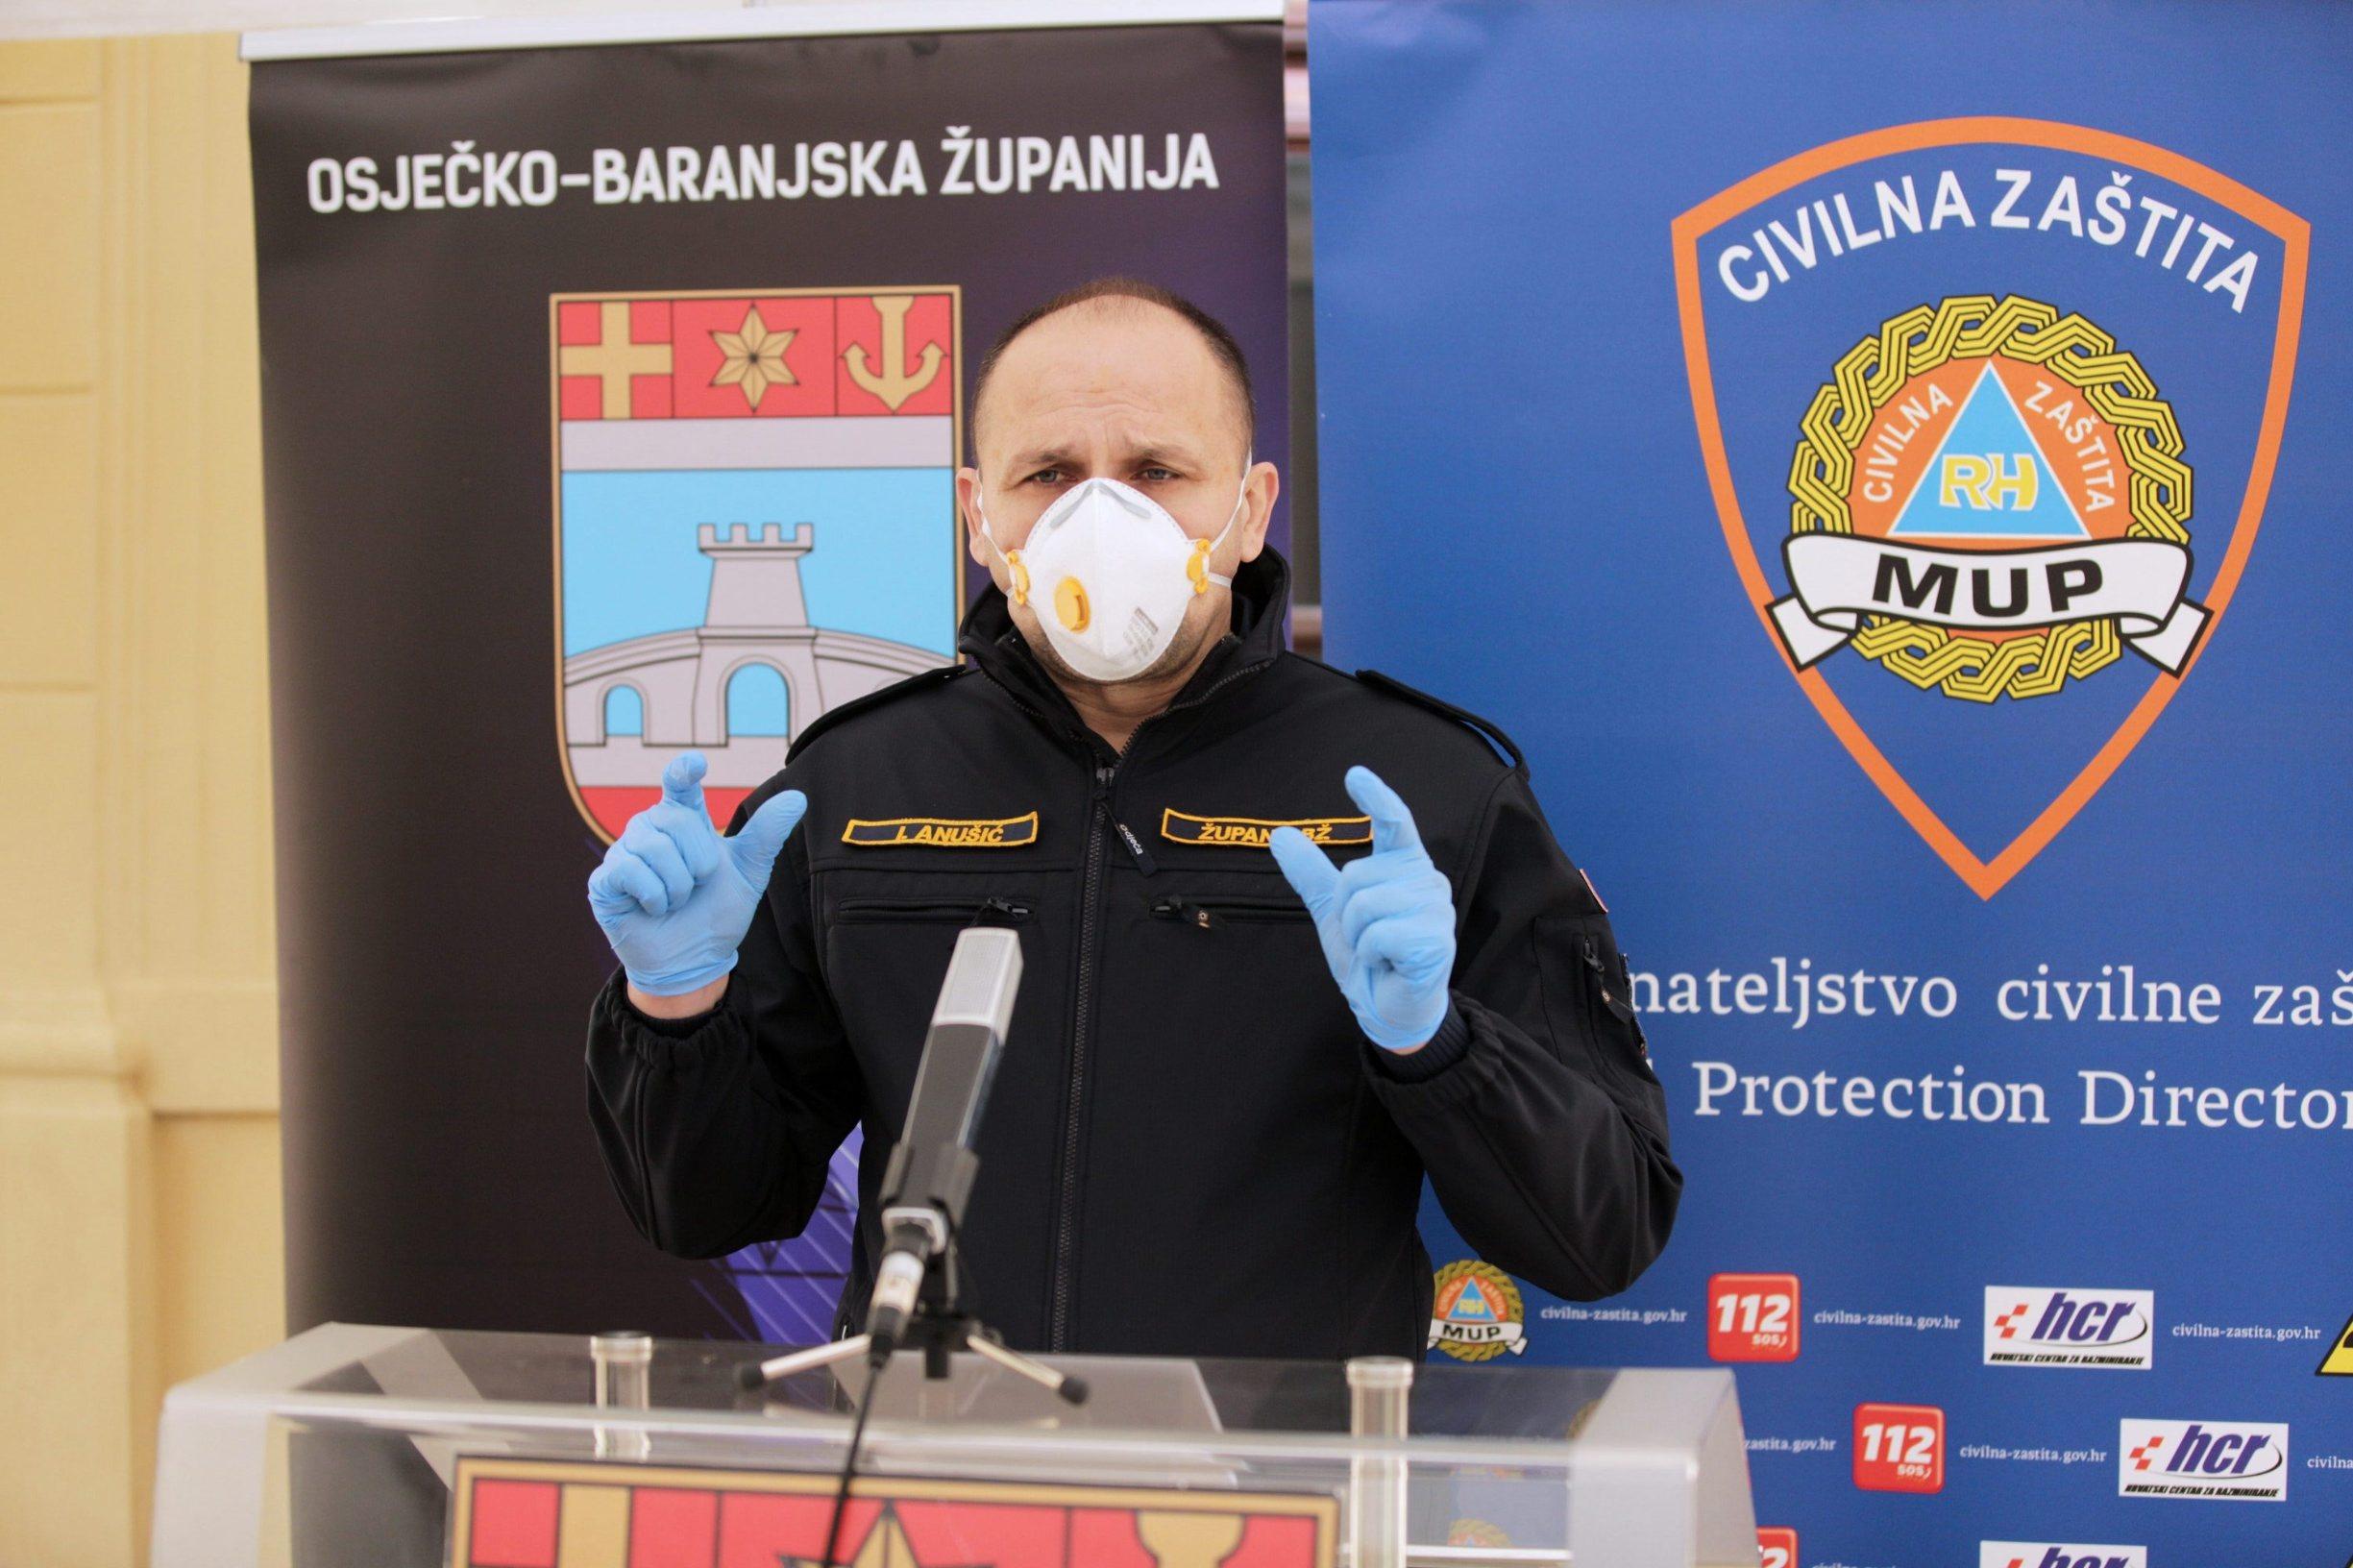 Ivan Anušić, osječko-baranjski župan